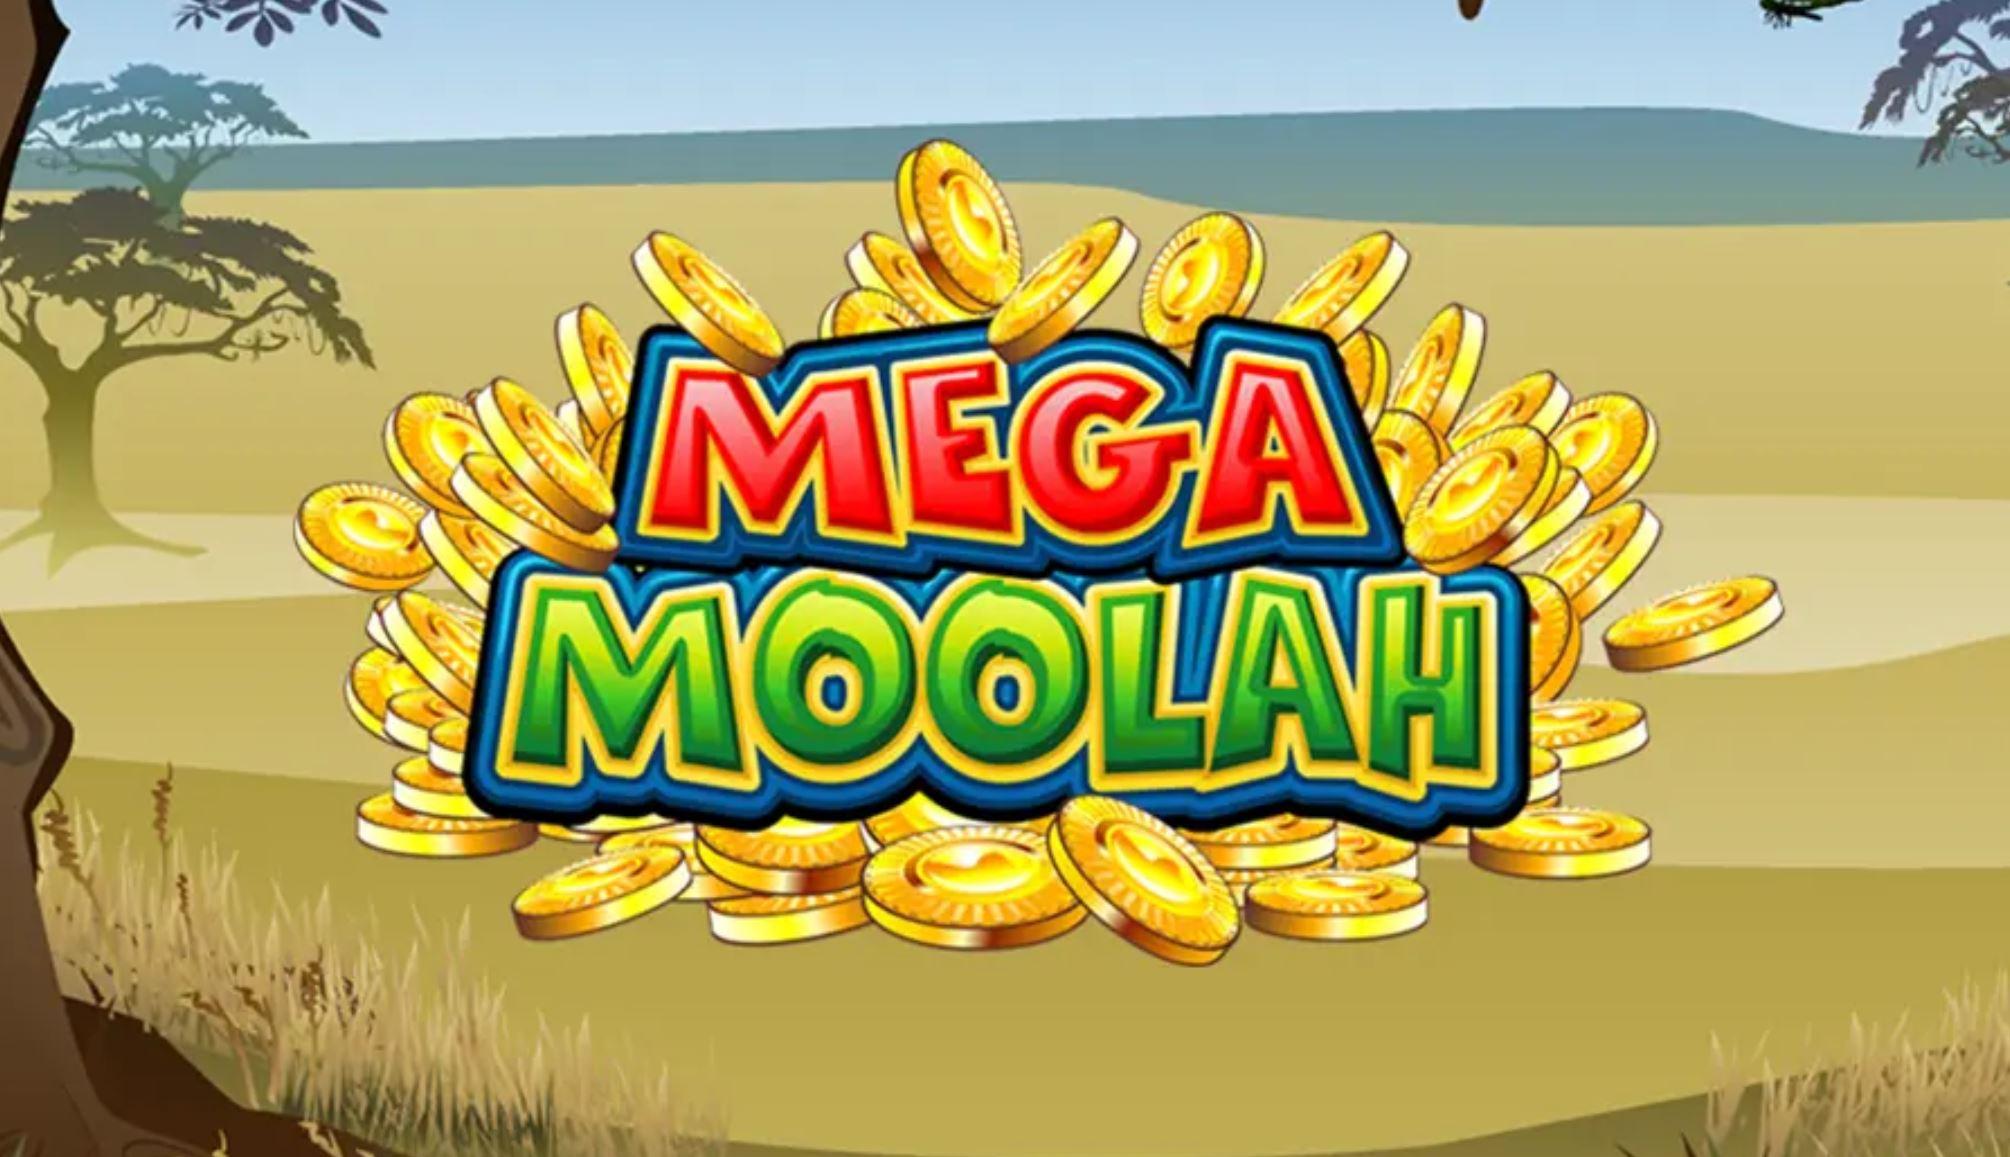 Mega Moolah Slots - The Biggest Online Slot Jackpots